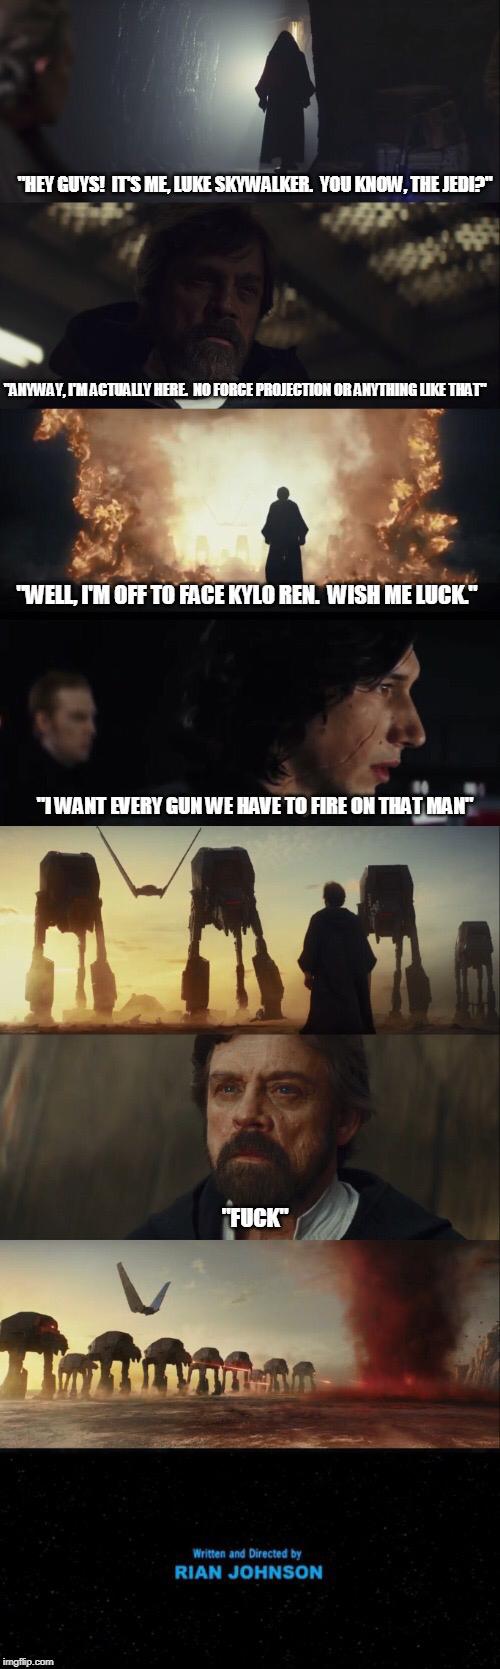 The Last Jedi: Alternate version